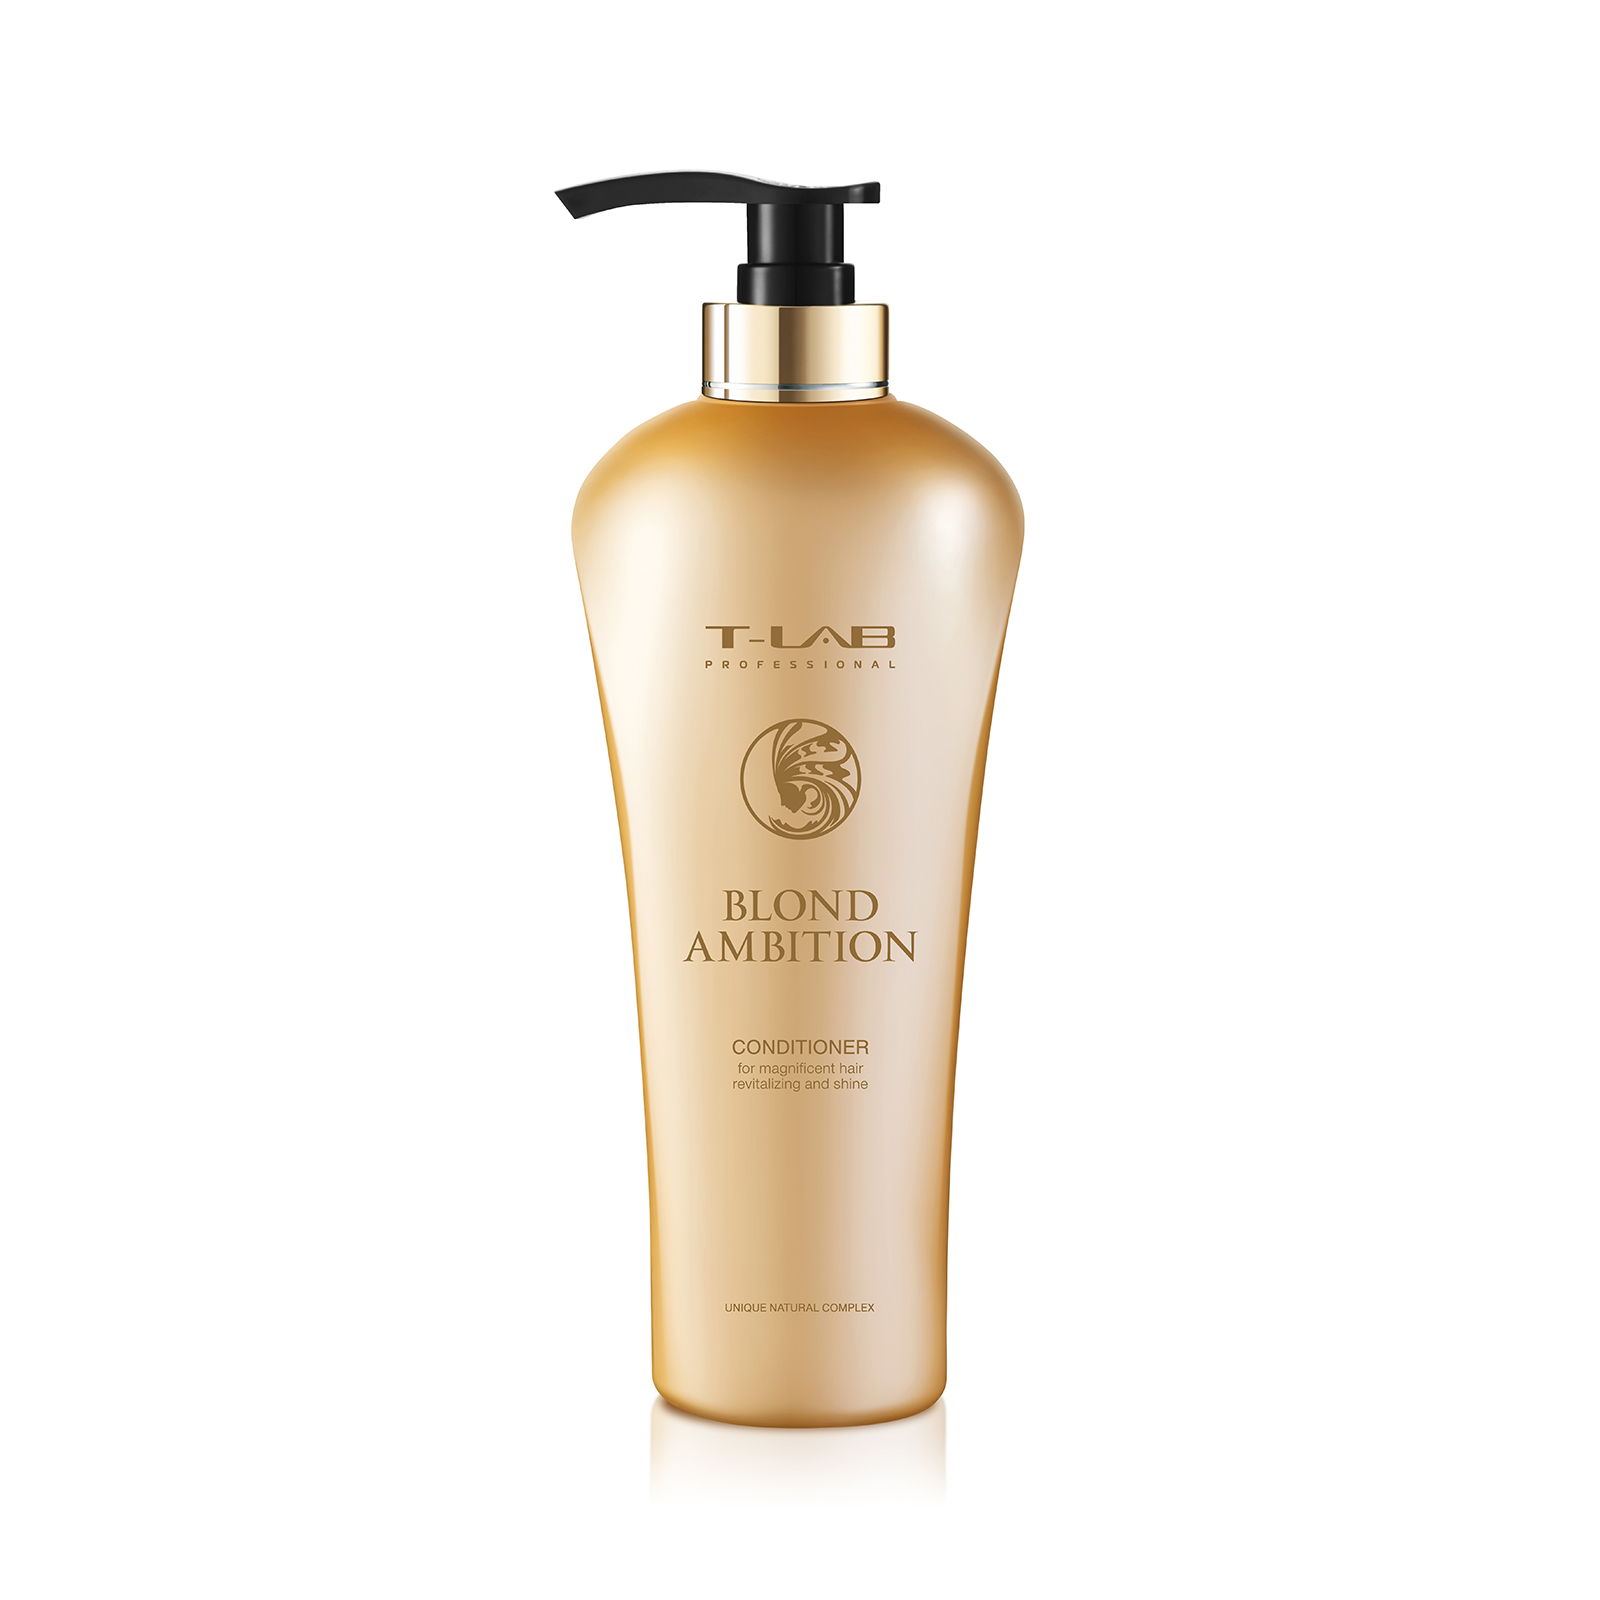 T-Lab Professional - Blond Ambition Conditioner 750 ml